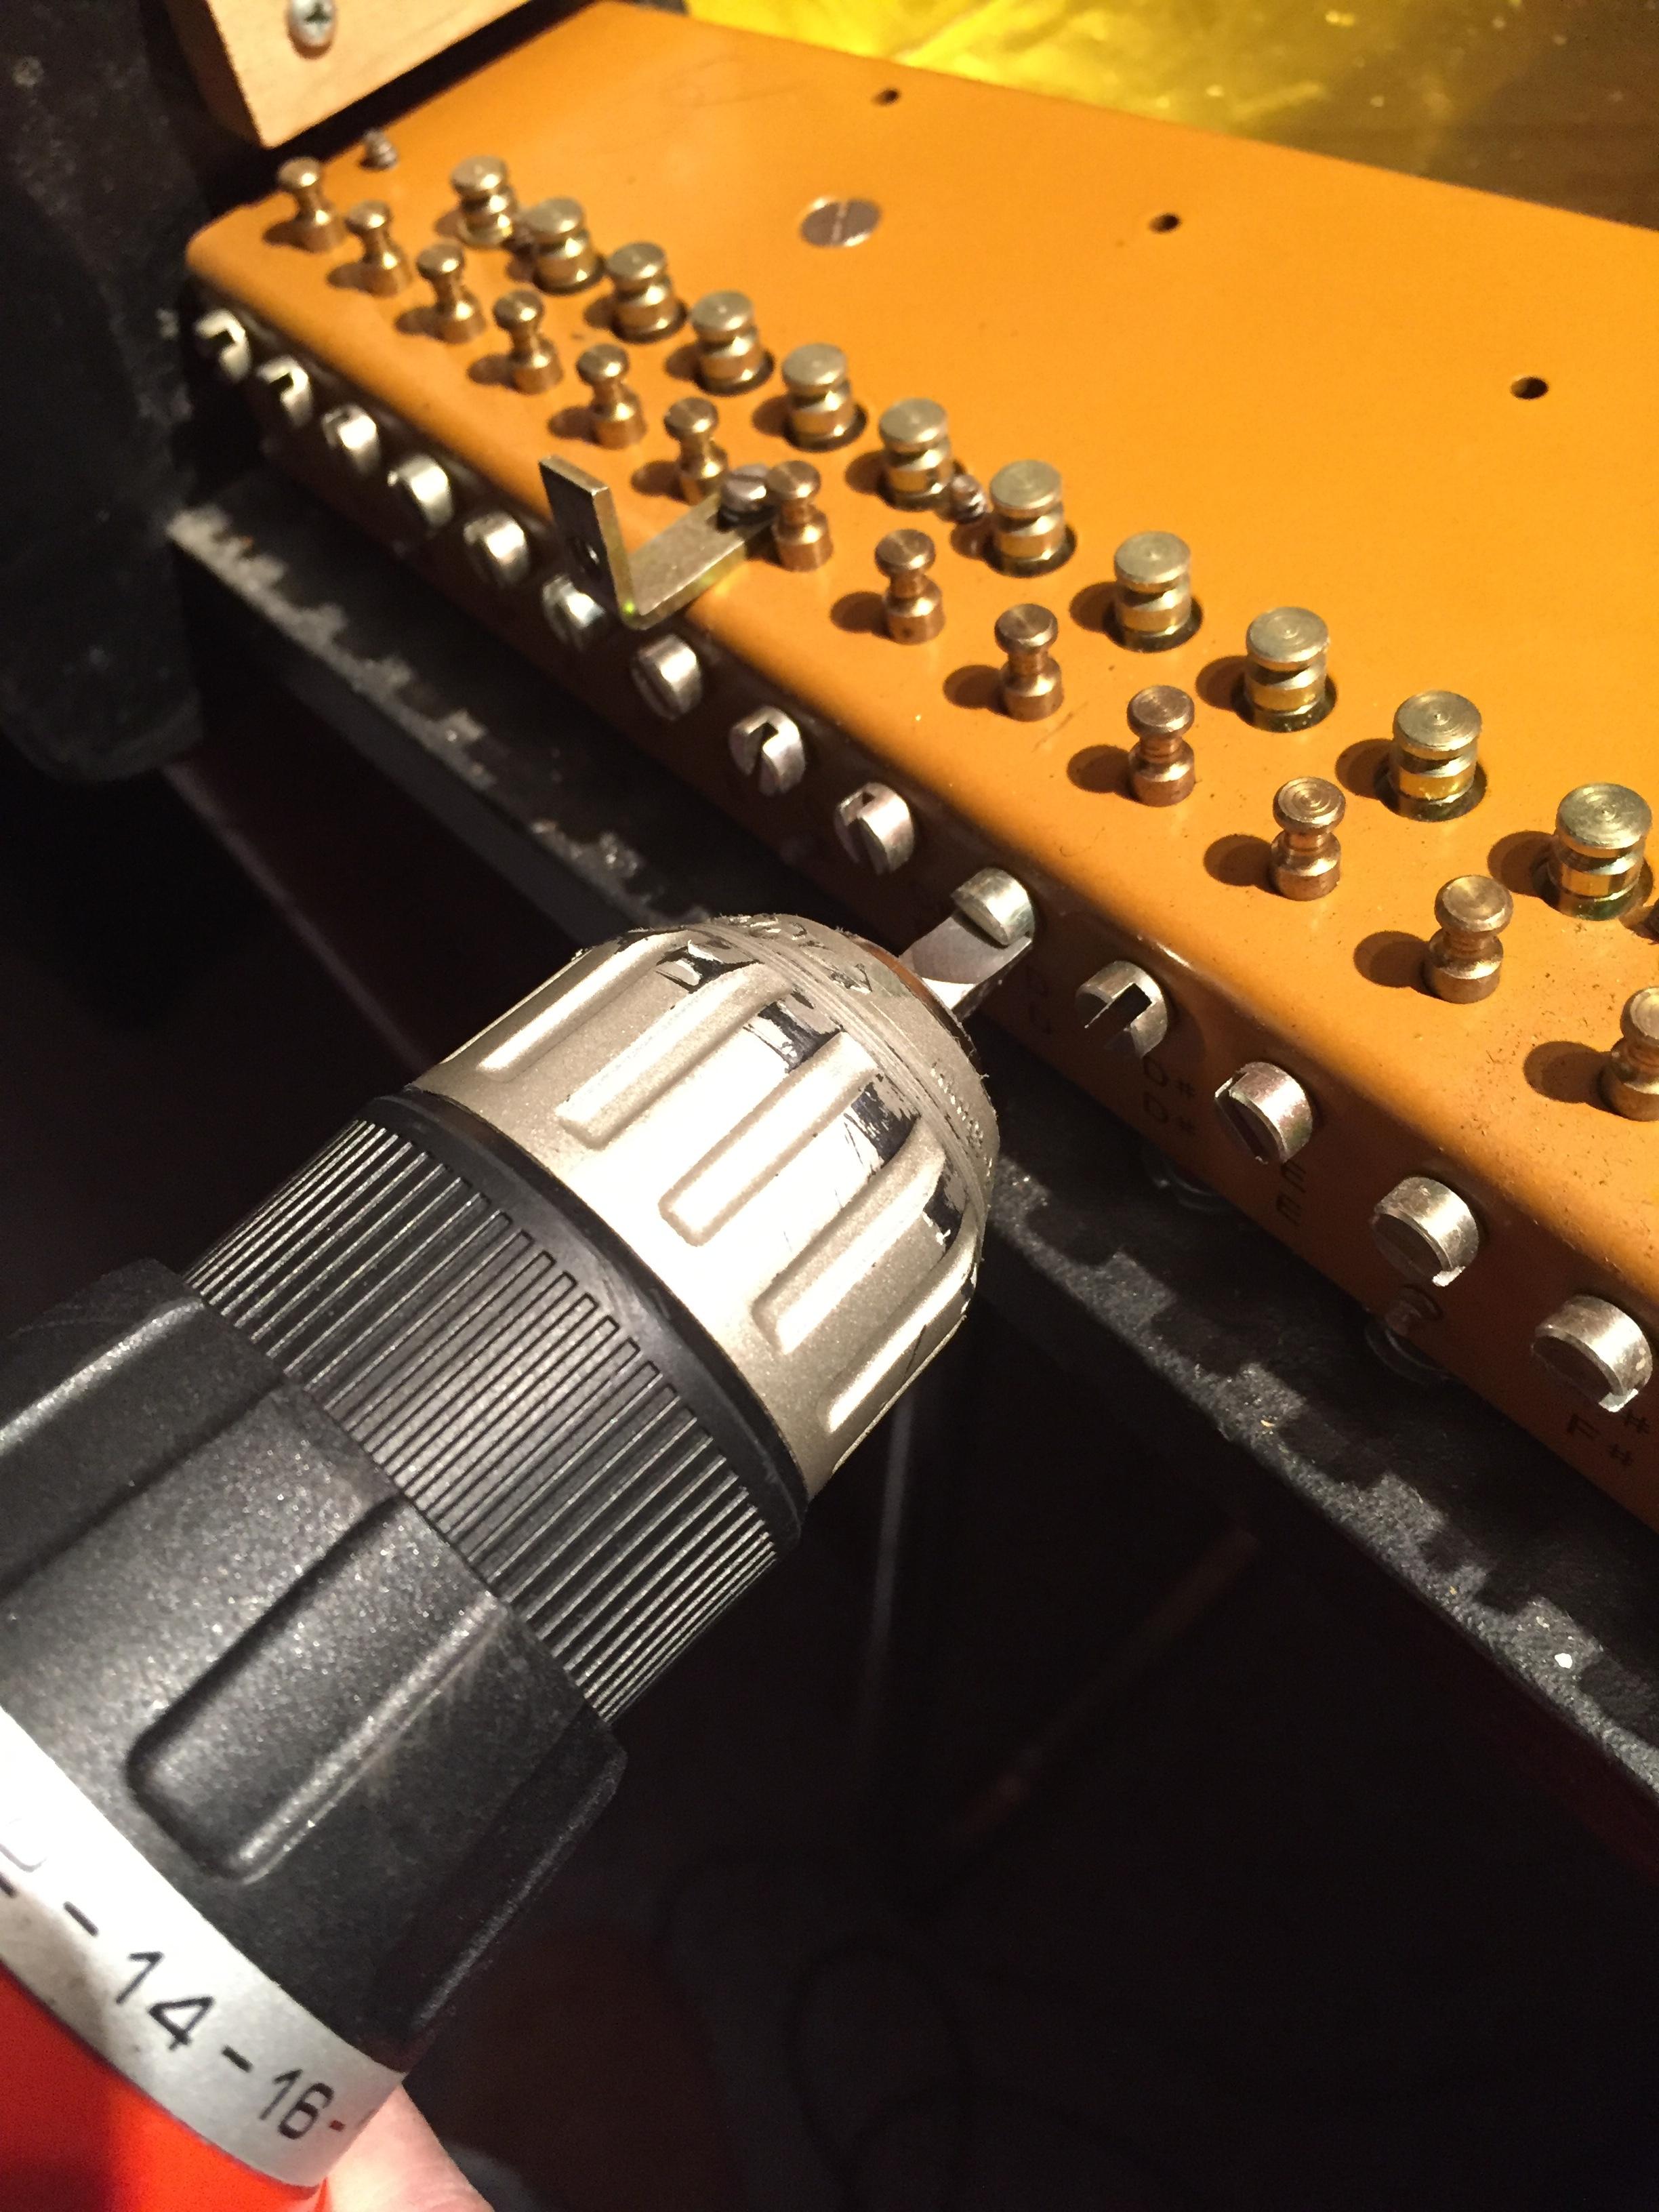 Aligning all the tuner holes for easier restringing.